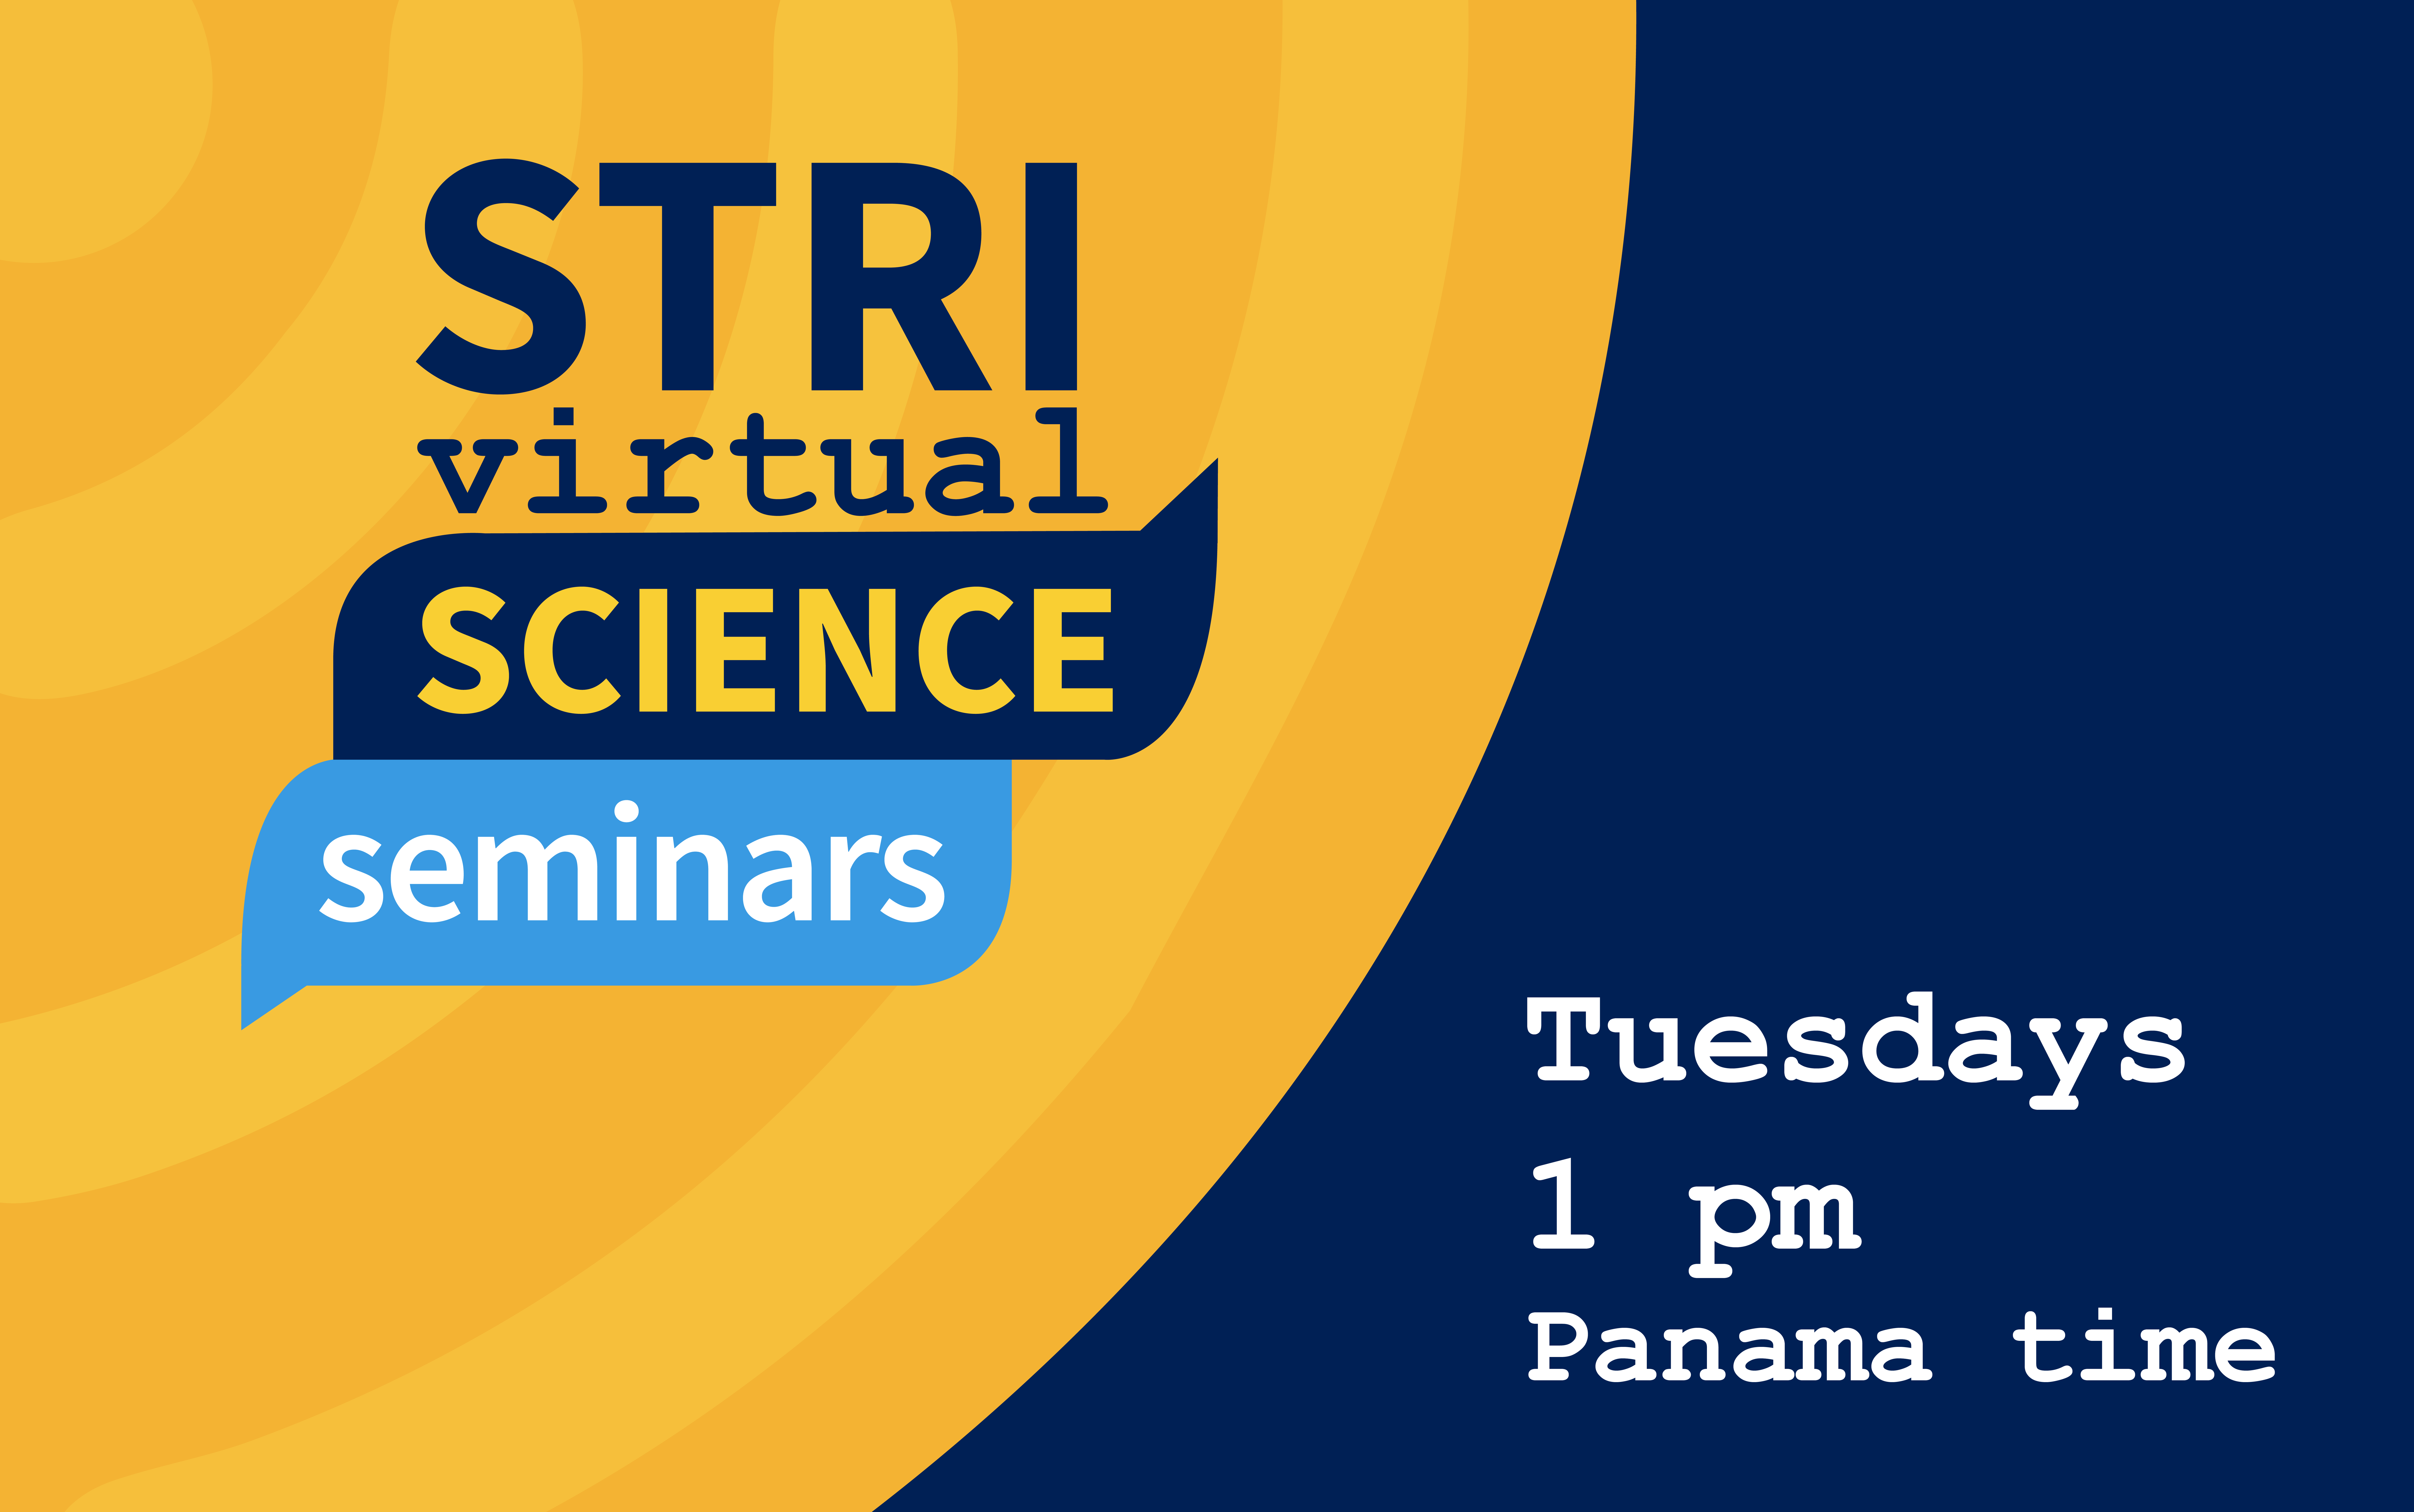 STRI Scientific Science Talks